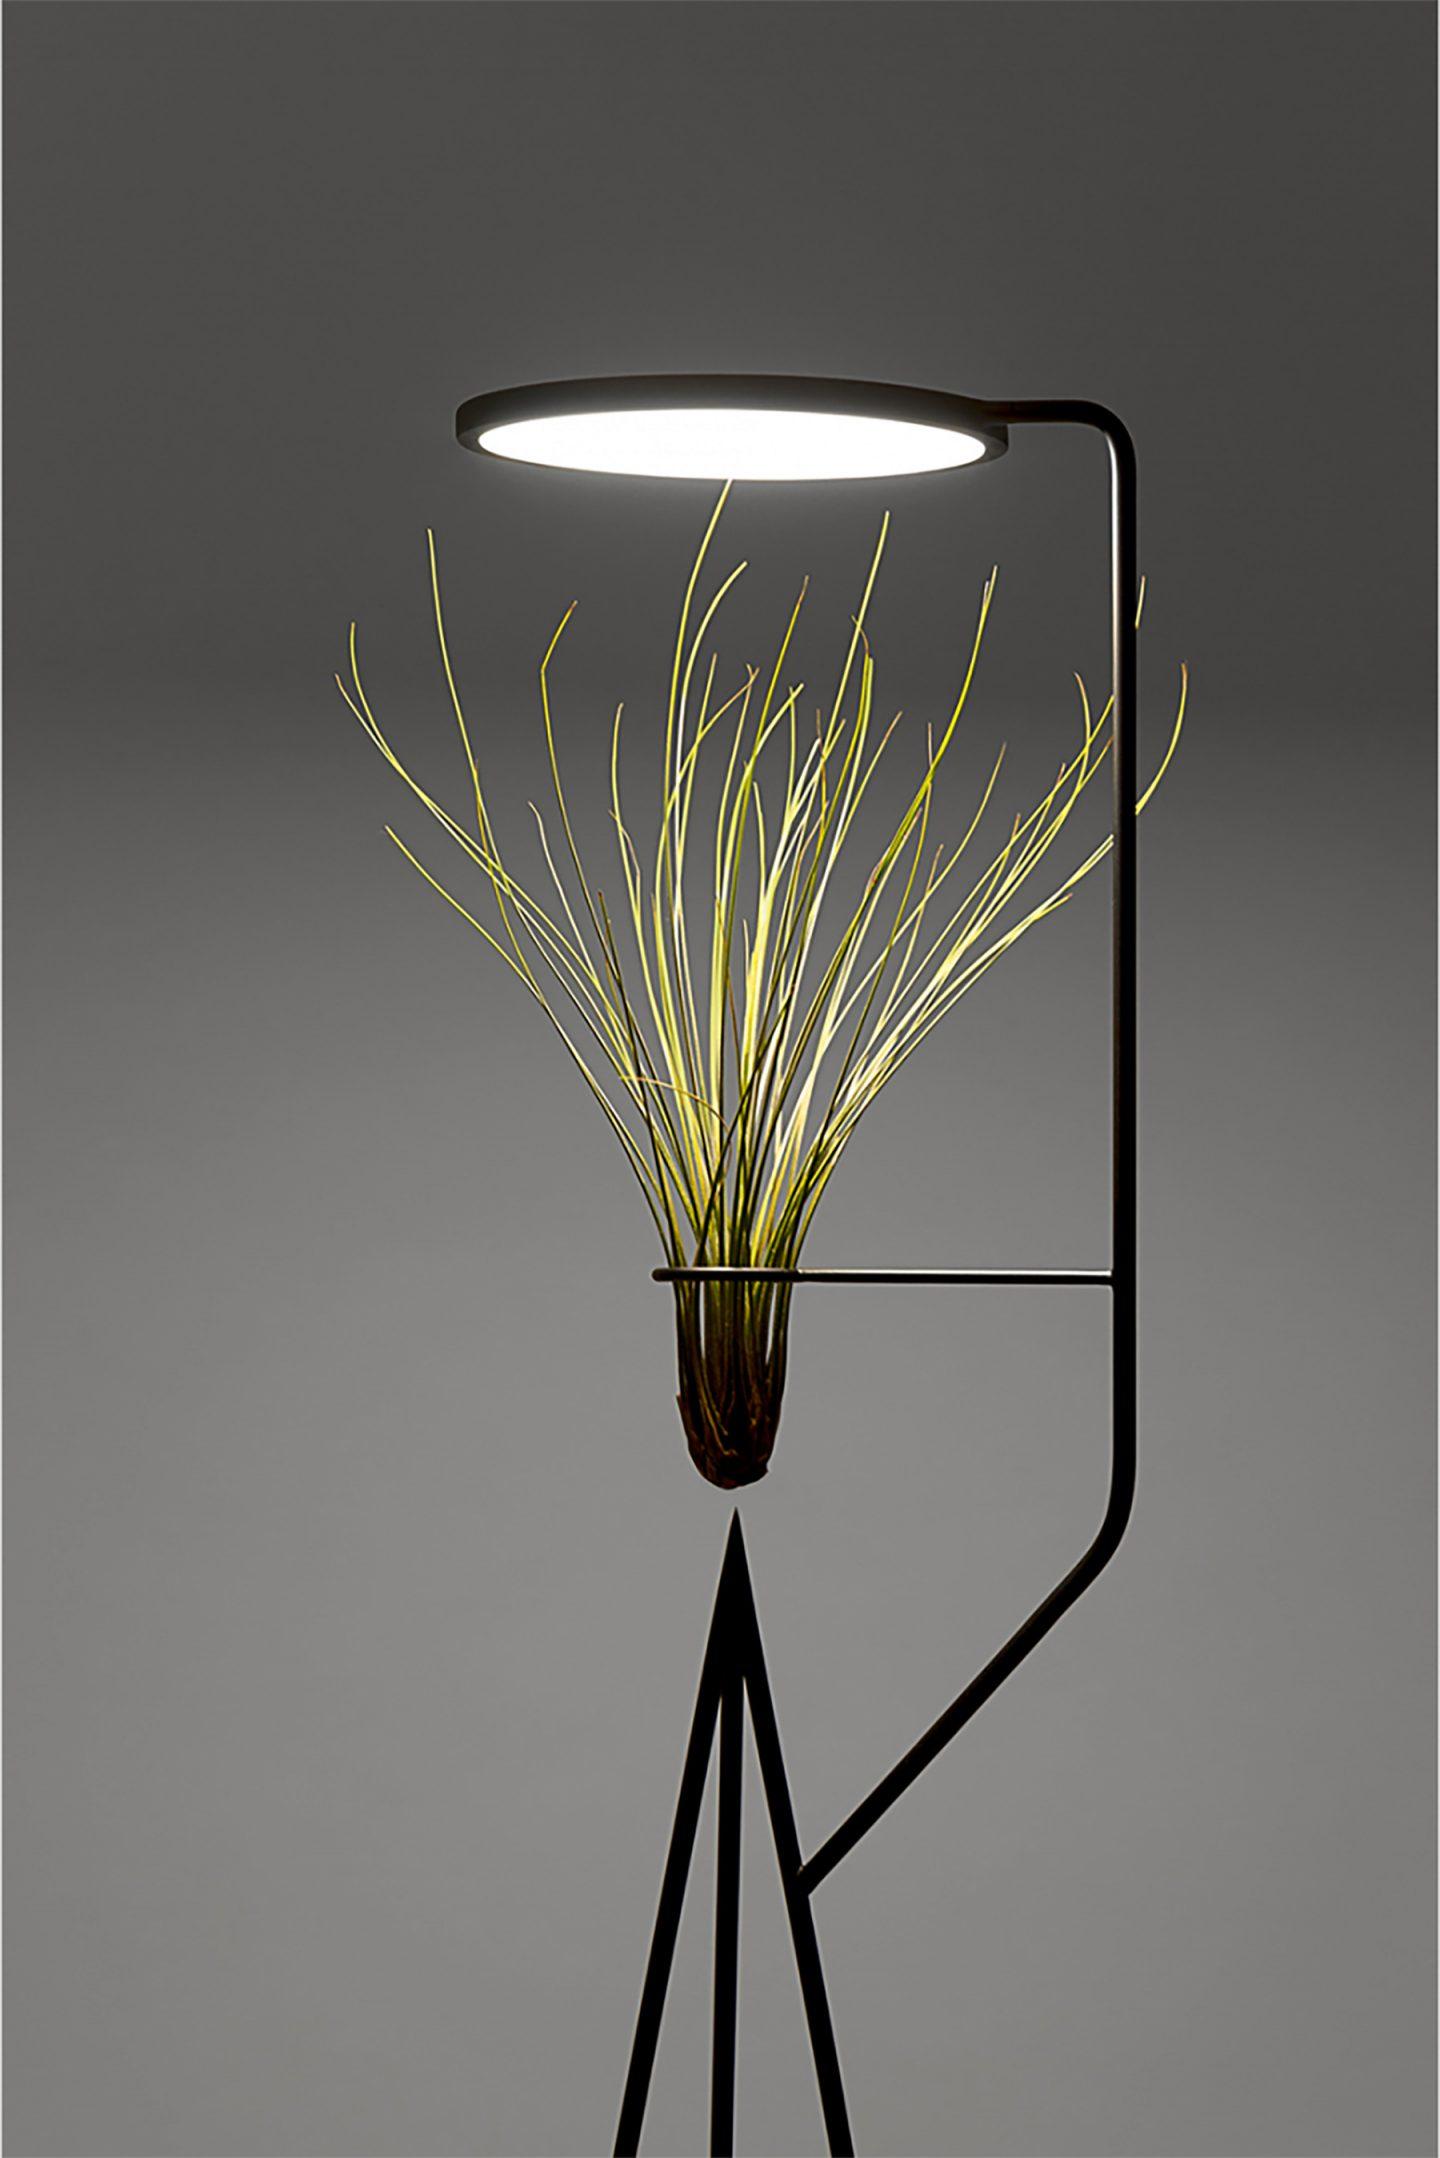 iGNANT-Design-Goula-Figuera-Viride-08 copy